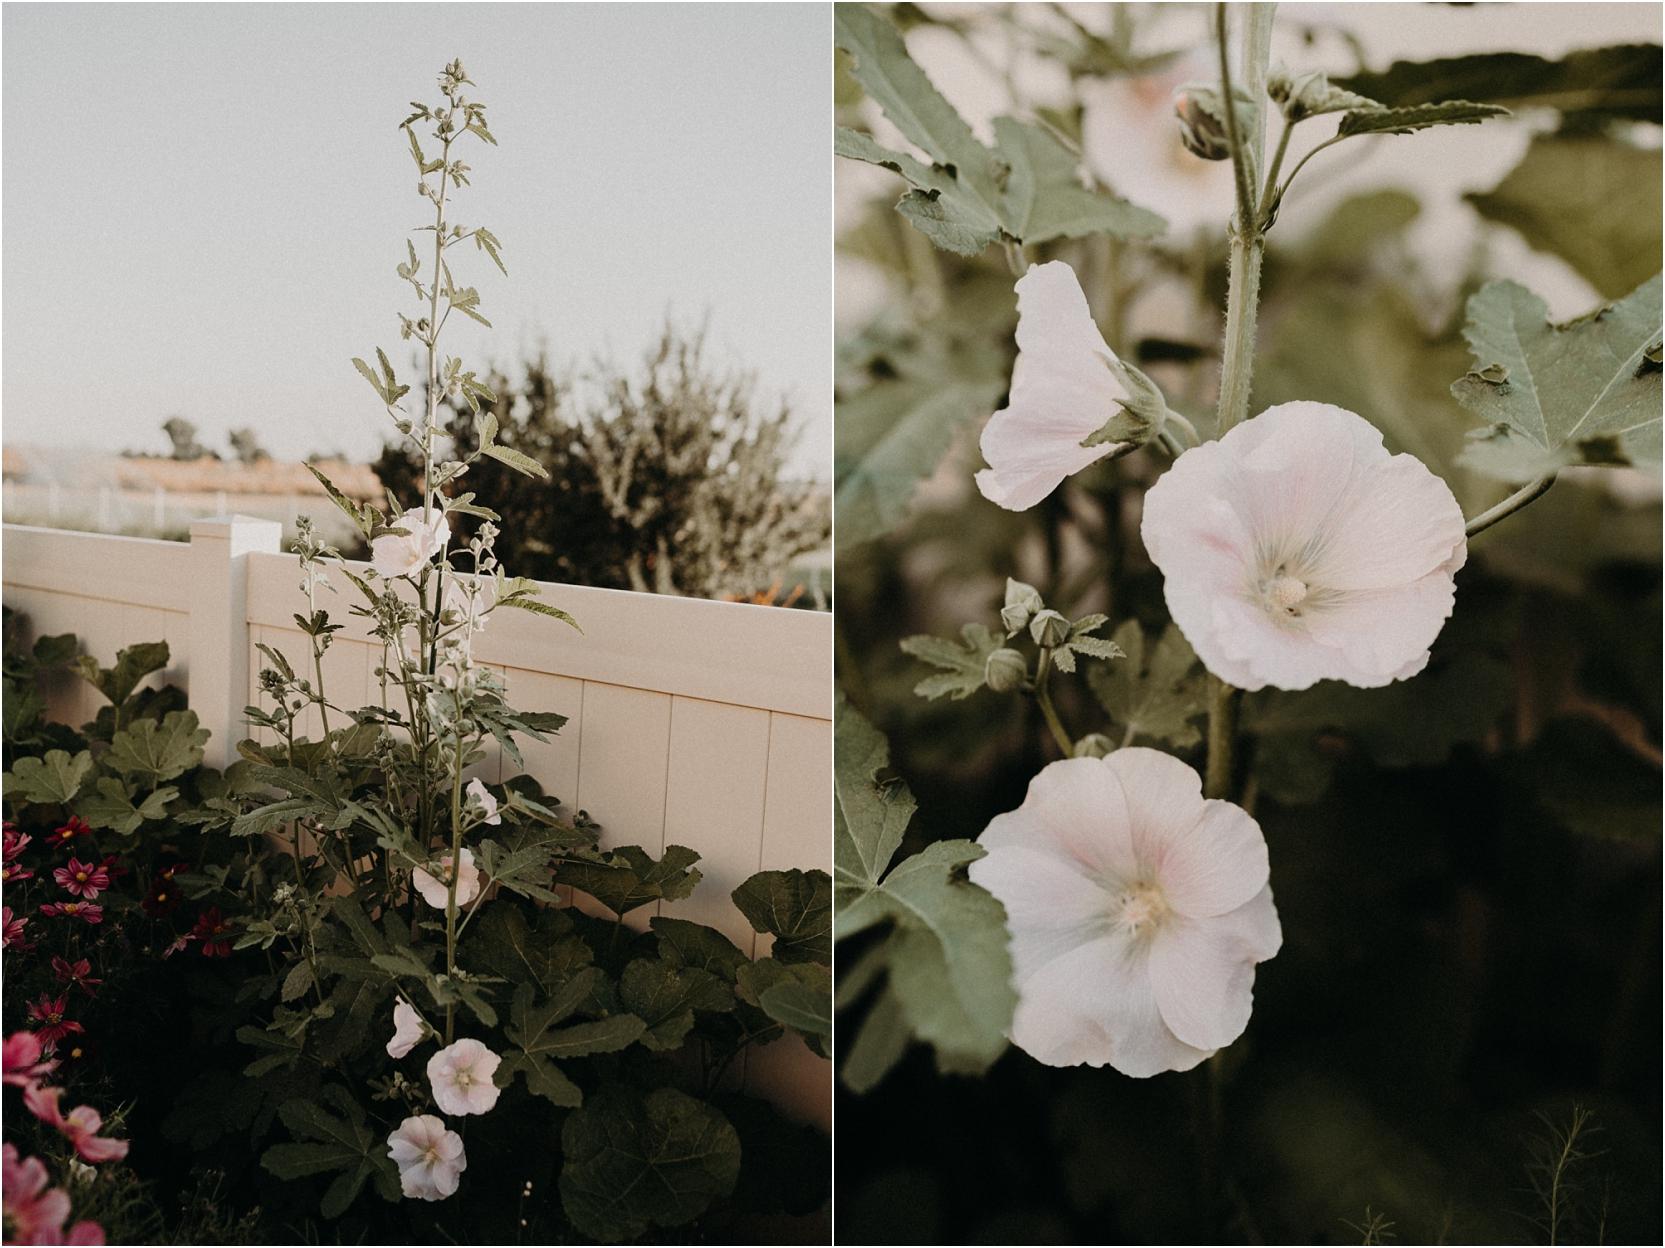 Hollyhocks Indian Springs Mix Cottage Garden Ideas flowers Boise photographer Makayla Madden Idaho Boise Landscaping Gardening ideas design